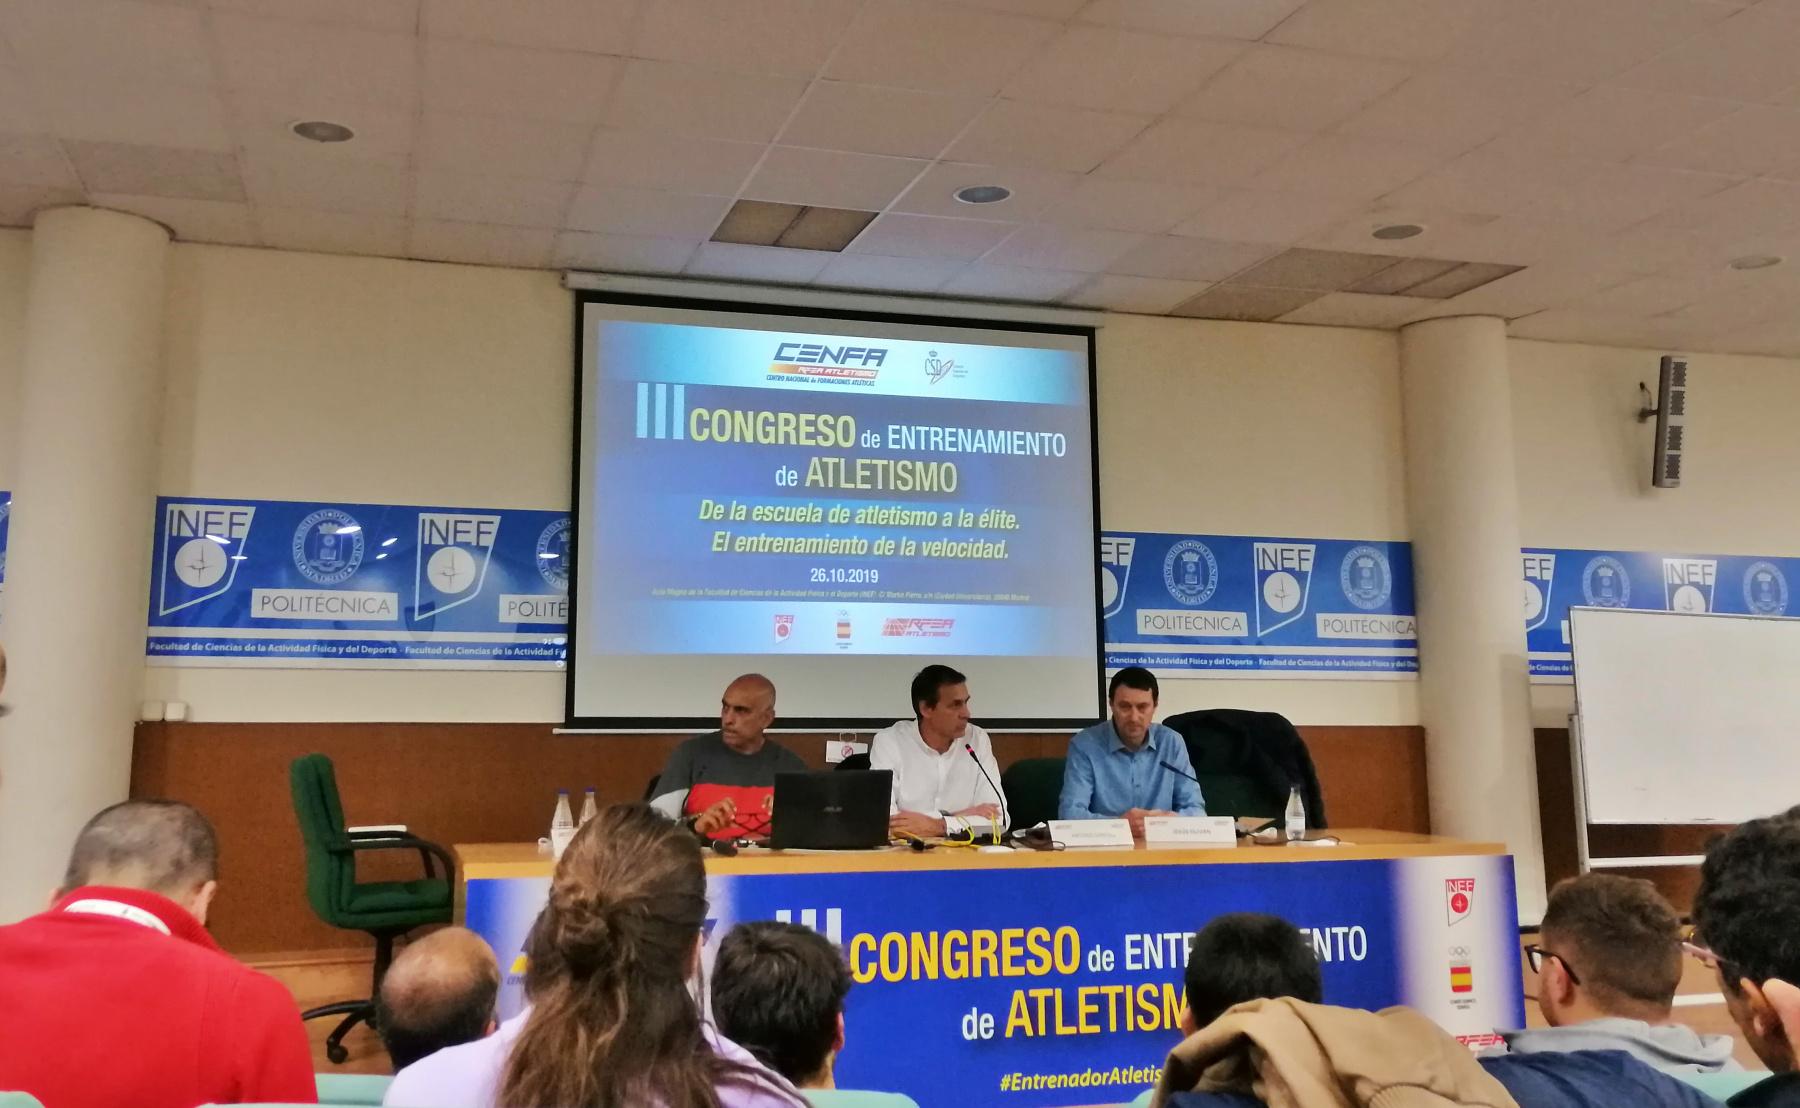 Congreso-Atletismo-Madrid_26102019-1